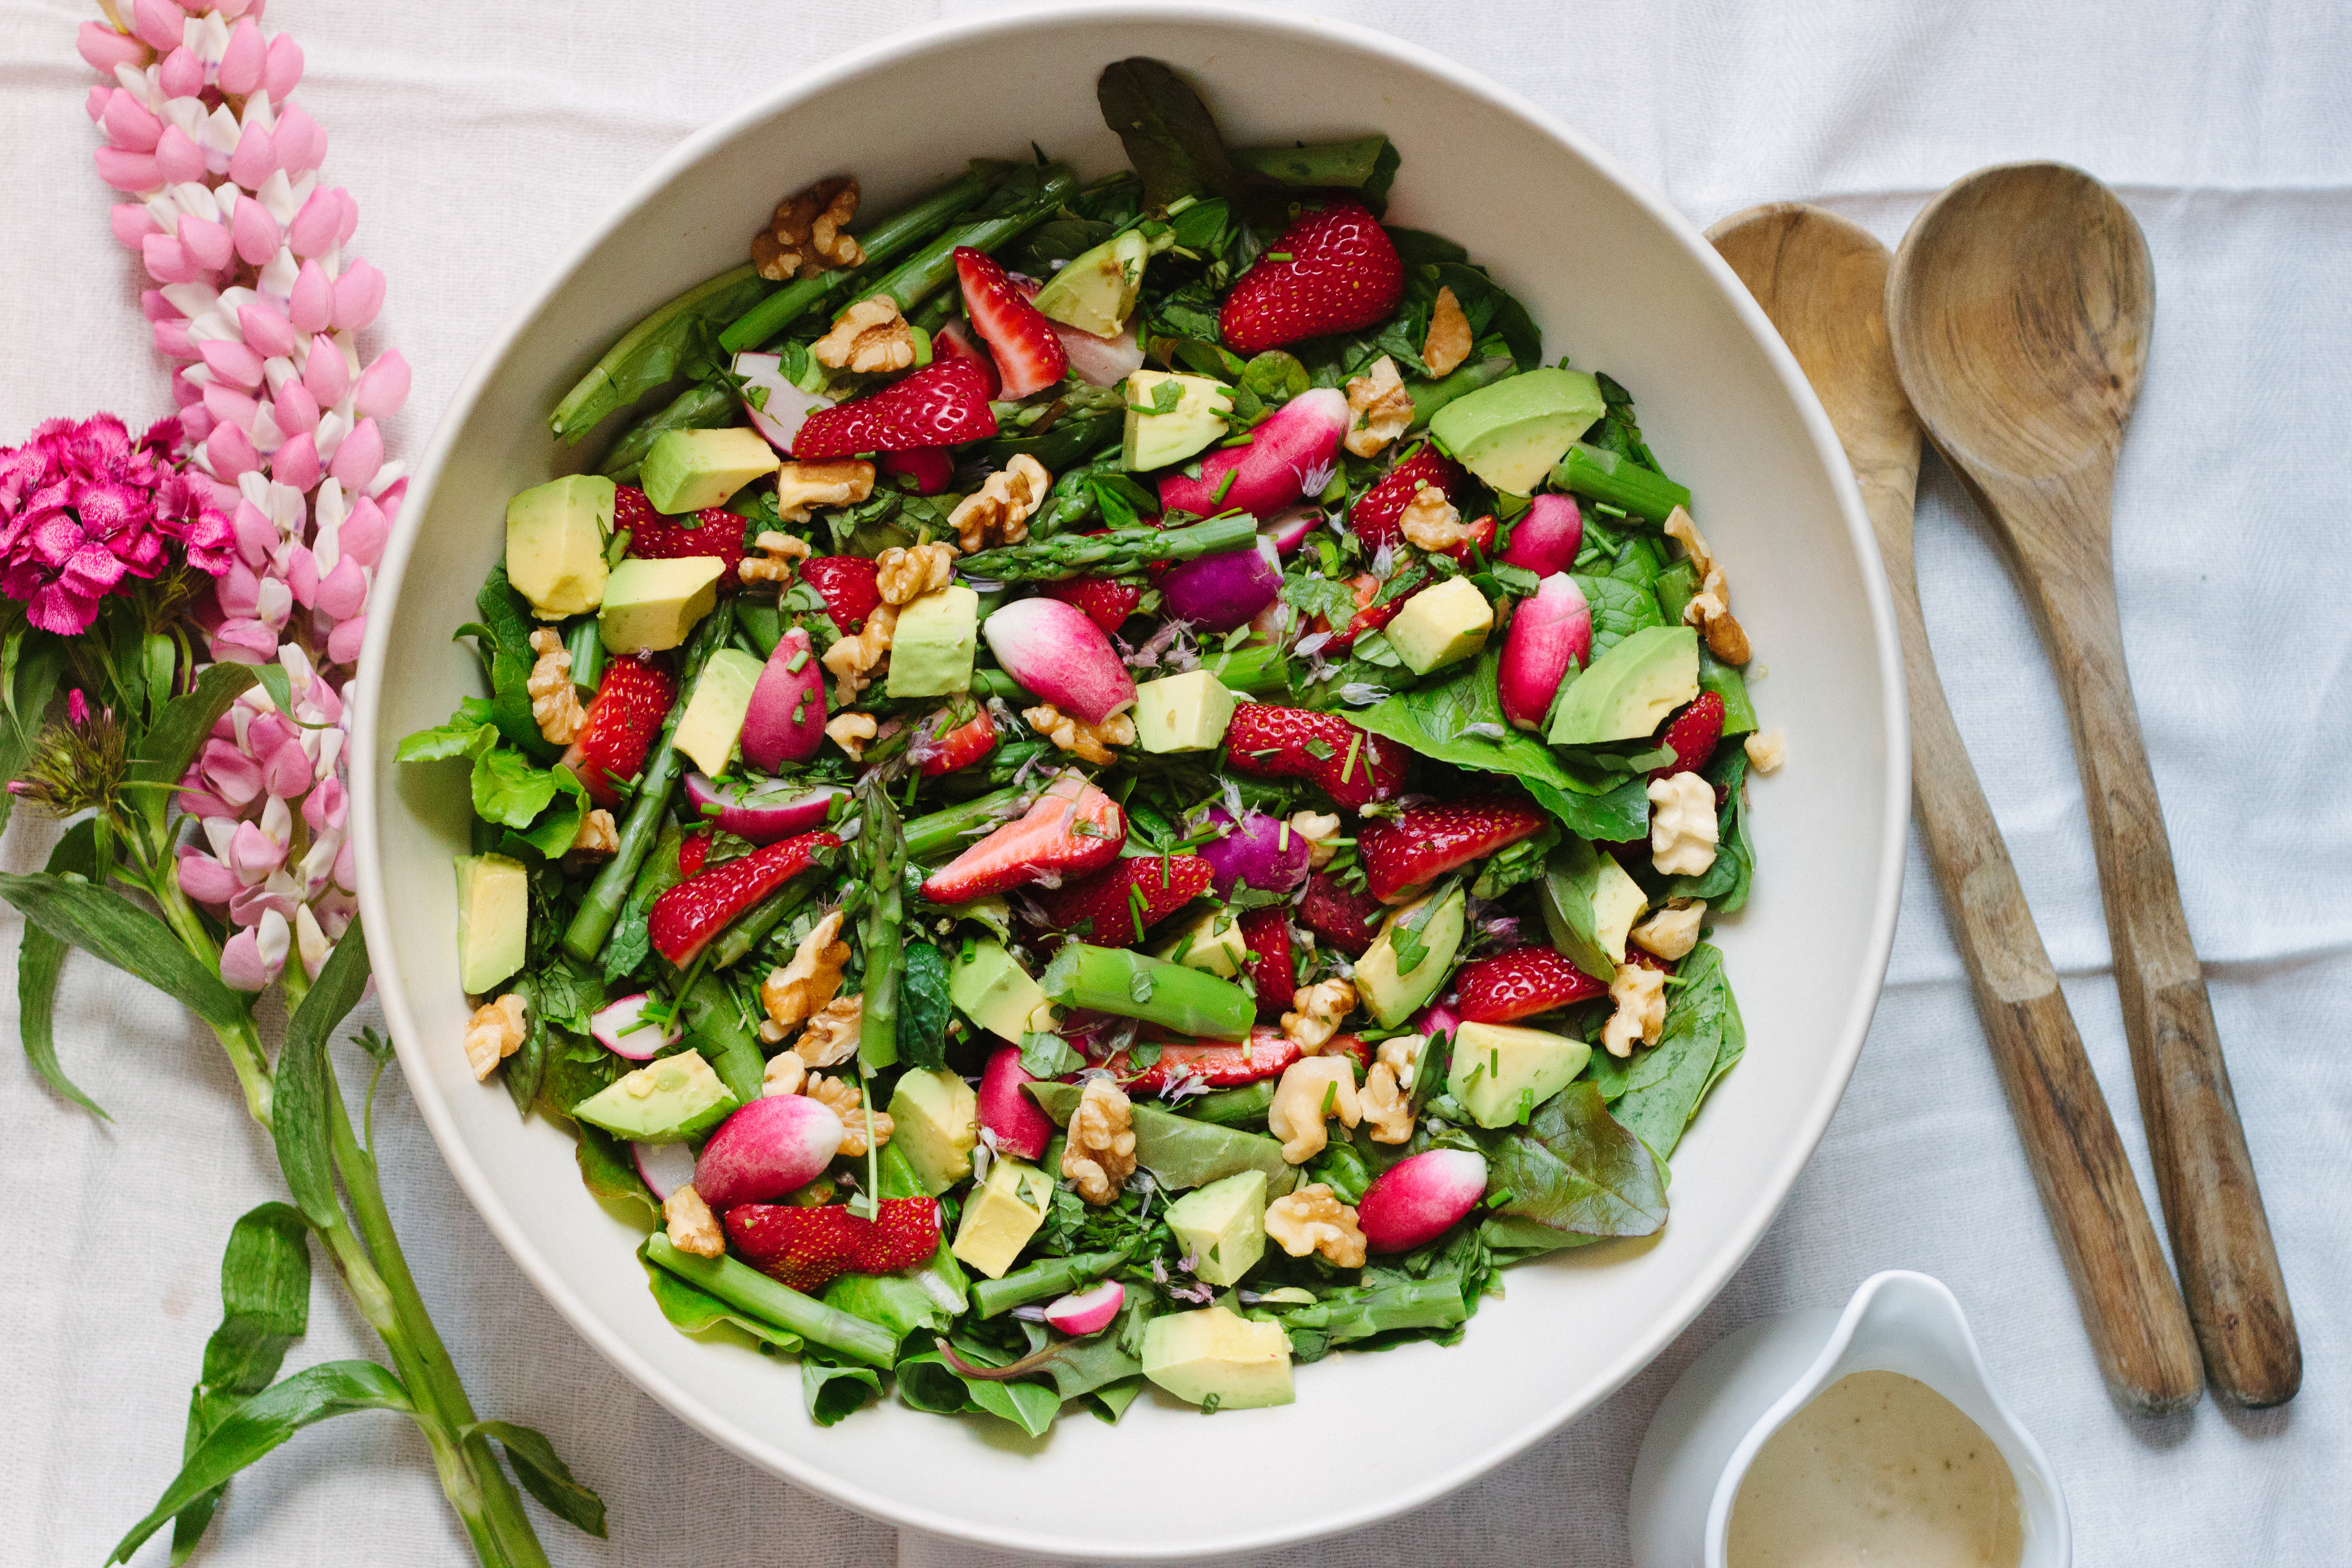 strawberry, asparagus, radish & greens salad with creamy green garlic dressing